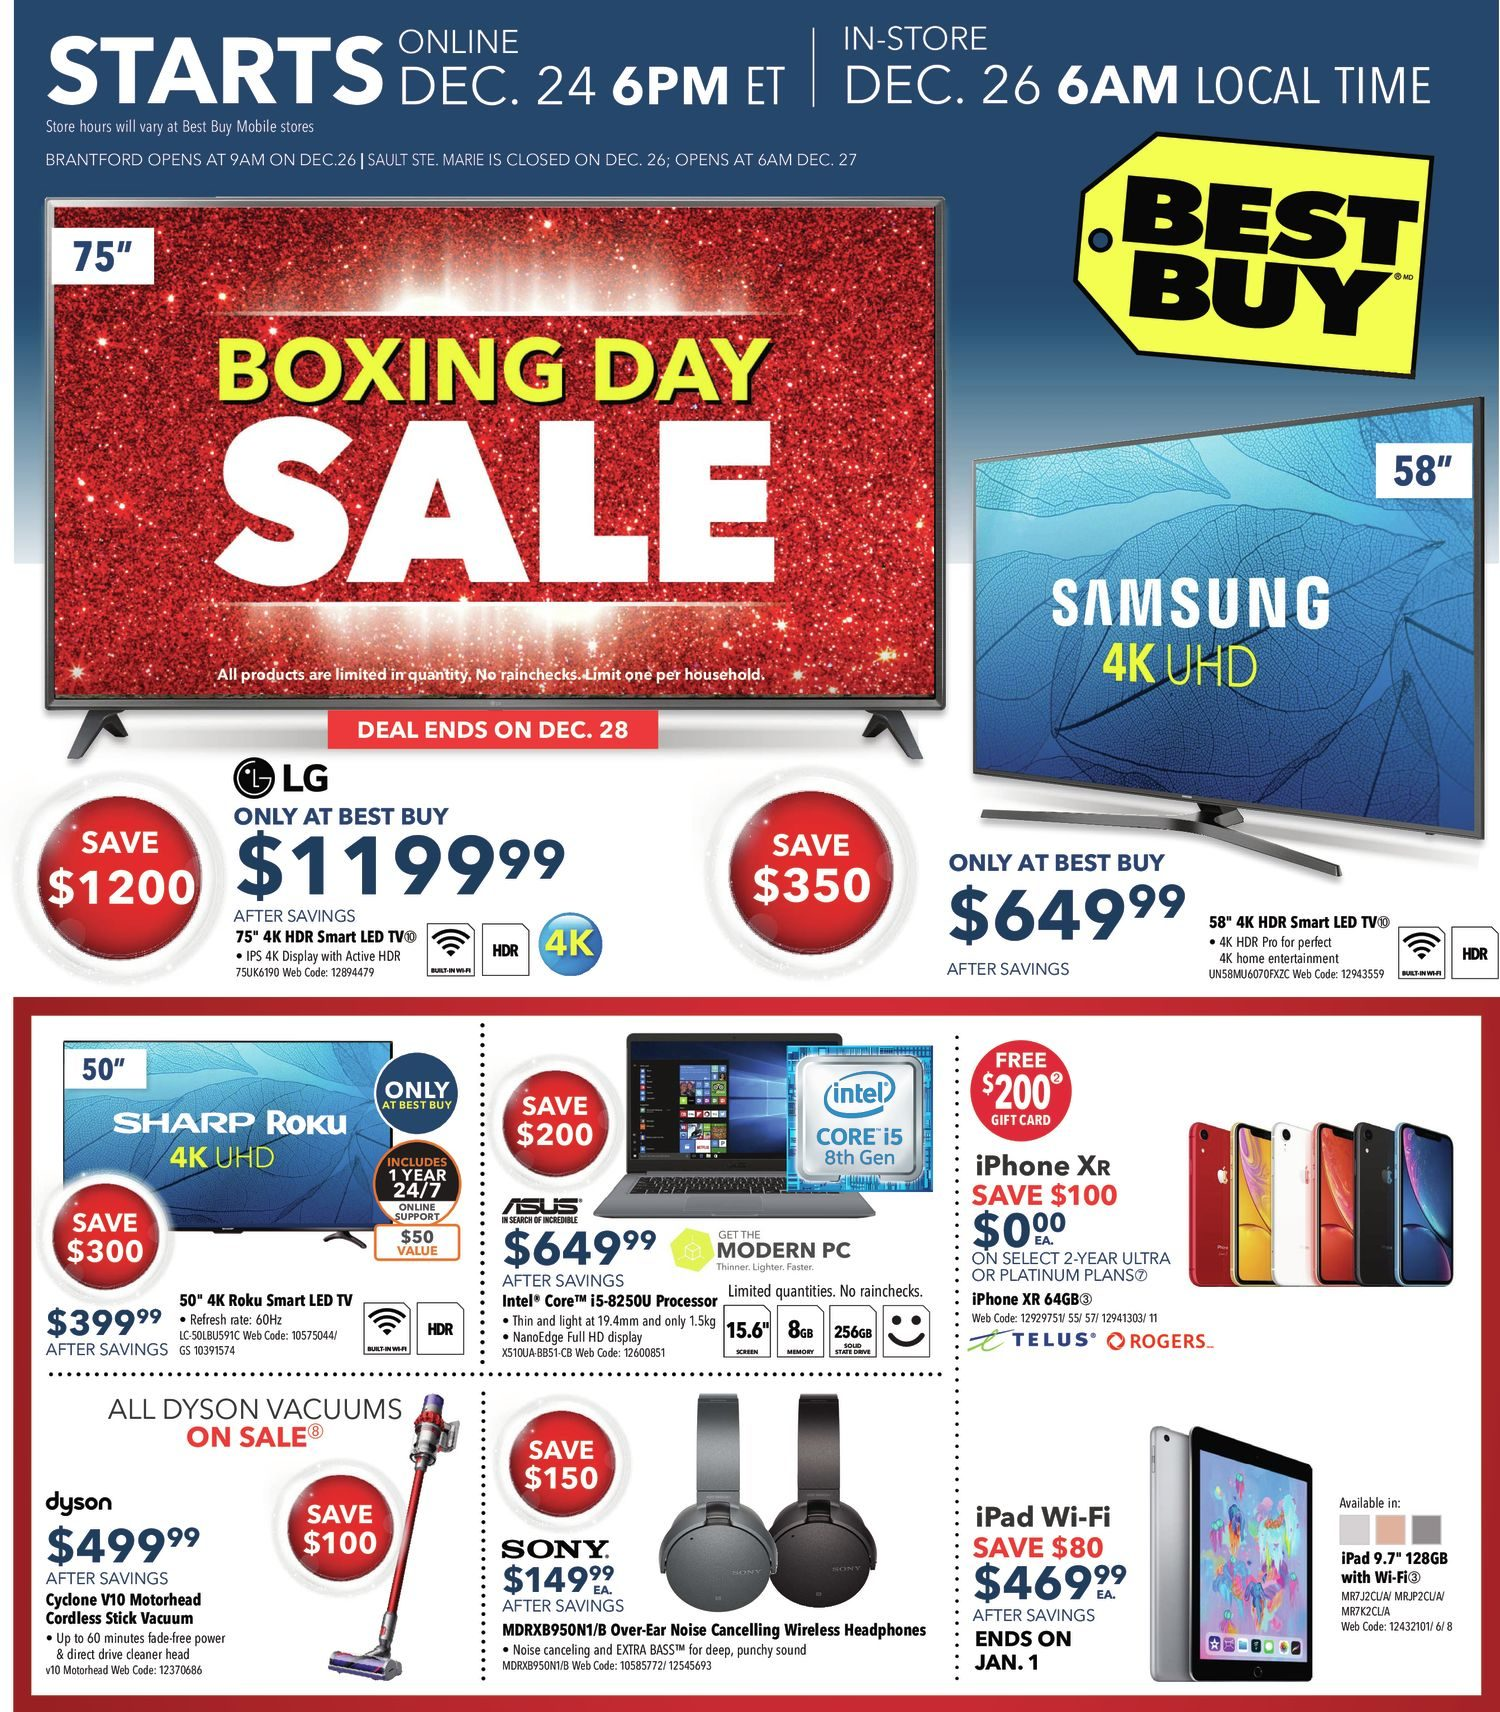 2c9ca5a667d Best Buy Weekly Flyer - Boxing Day Sale - Dec 25 – Jan 3 - RedFlagDeals.com